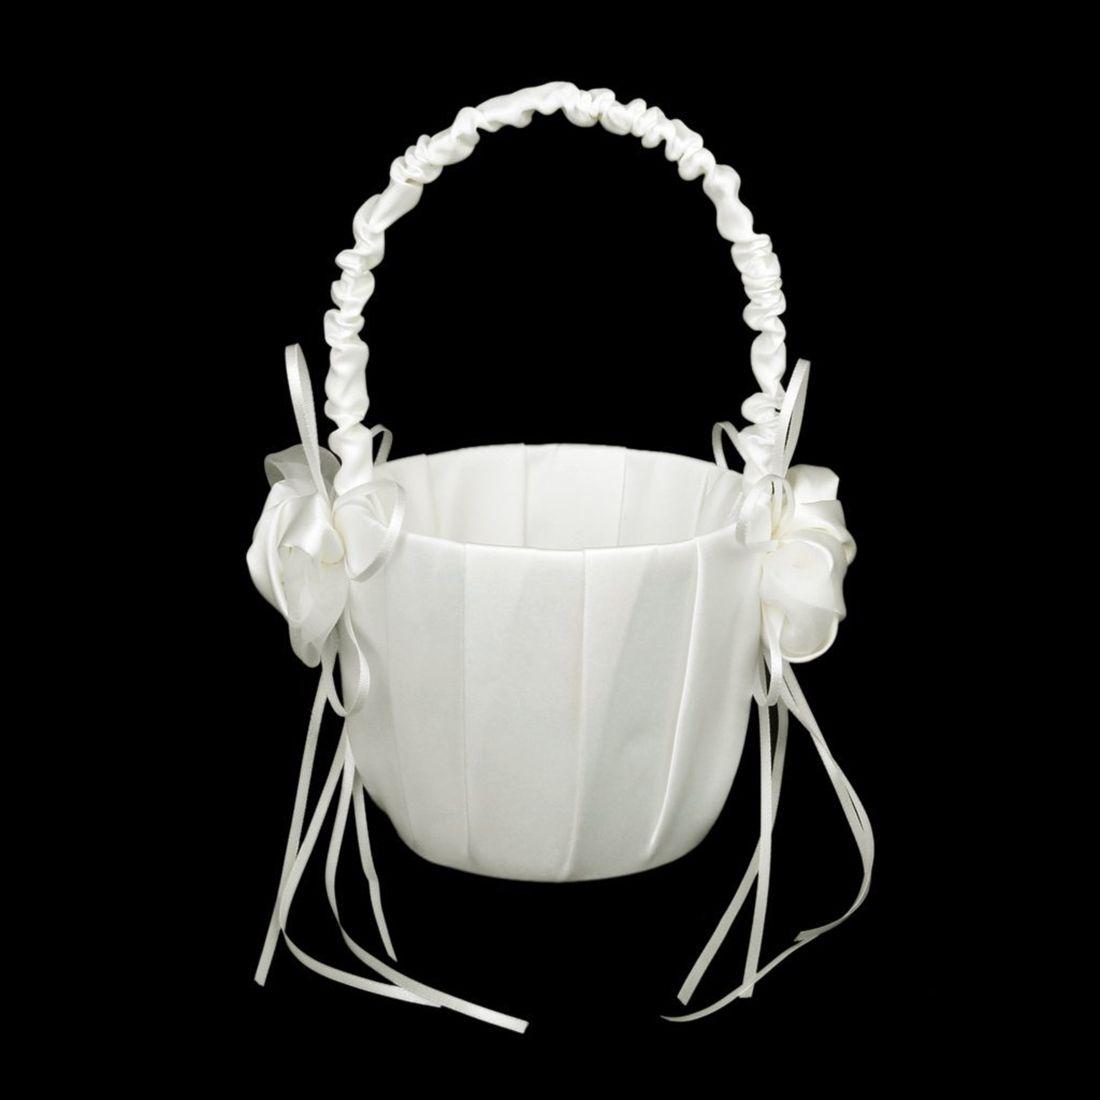 Satin Wedding Flower Basket Ornate Of Buds For Wedding White